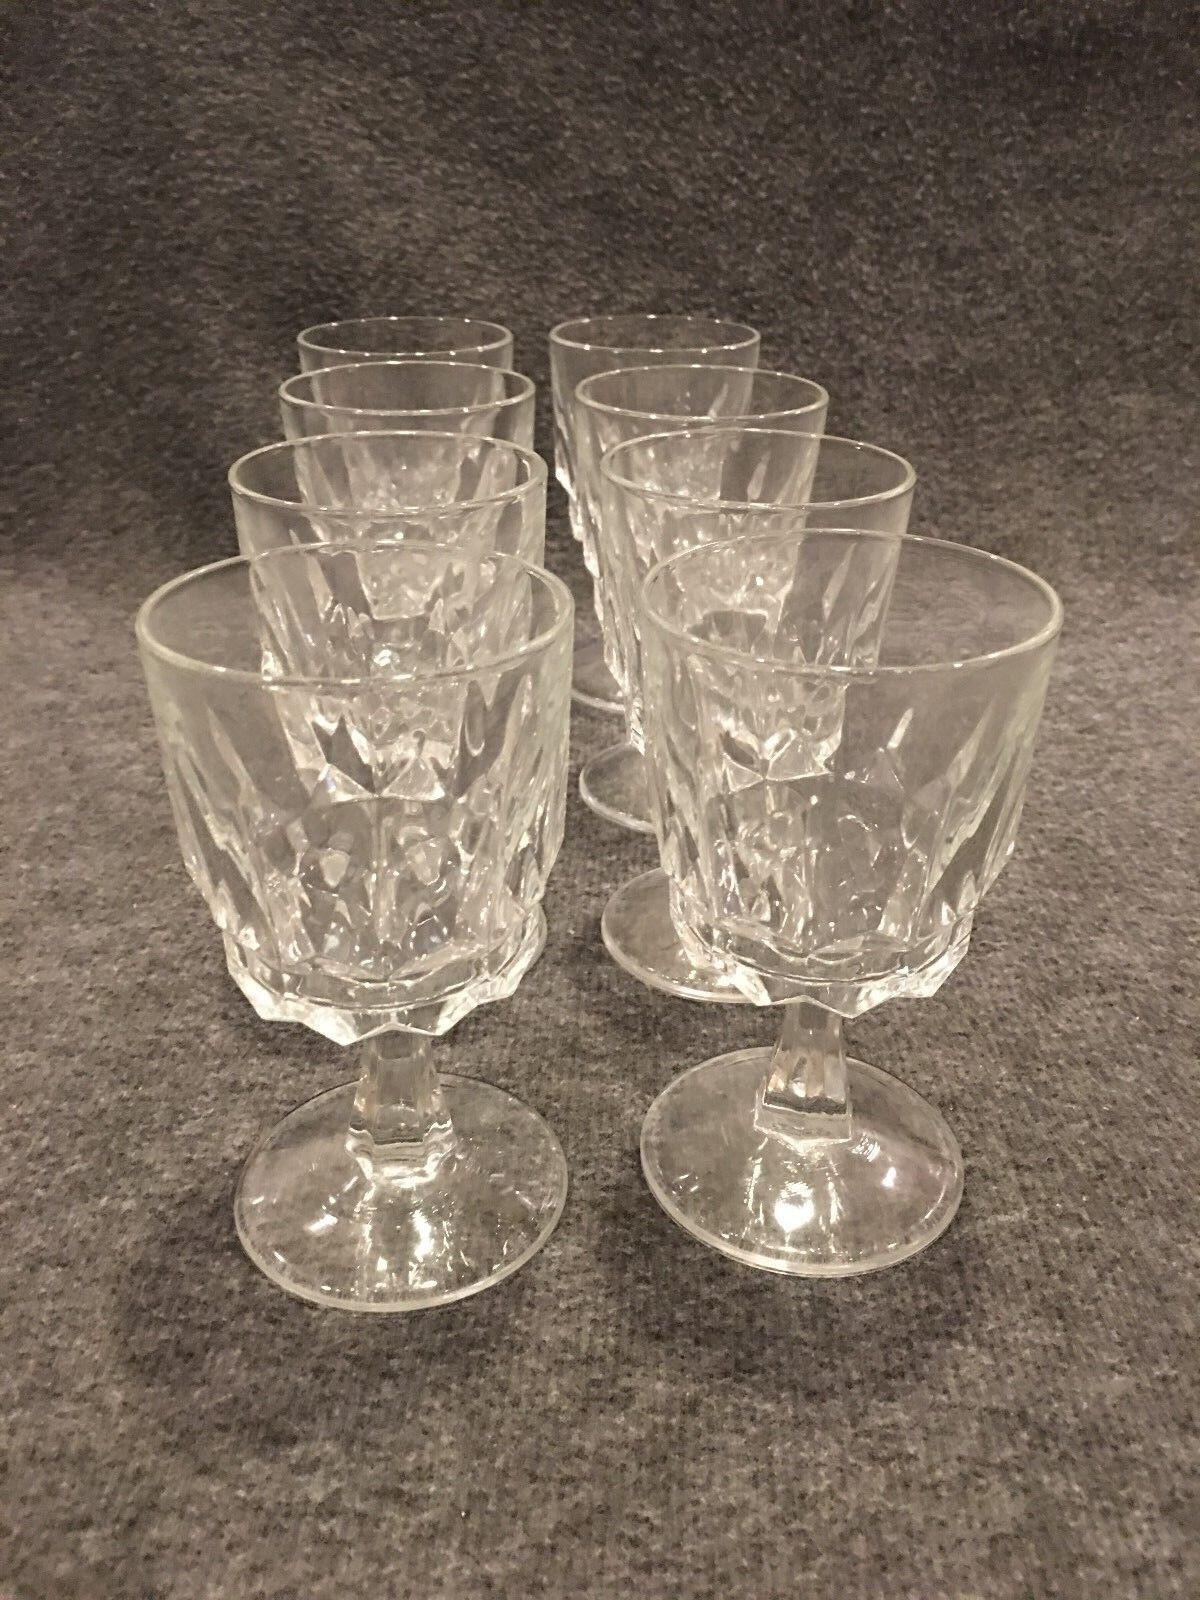 Stemmed Glasses Wine   Sherry 4.5 4.5 4.5 oz Set of 8 a4e253